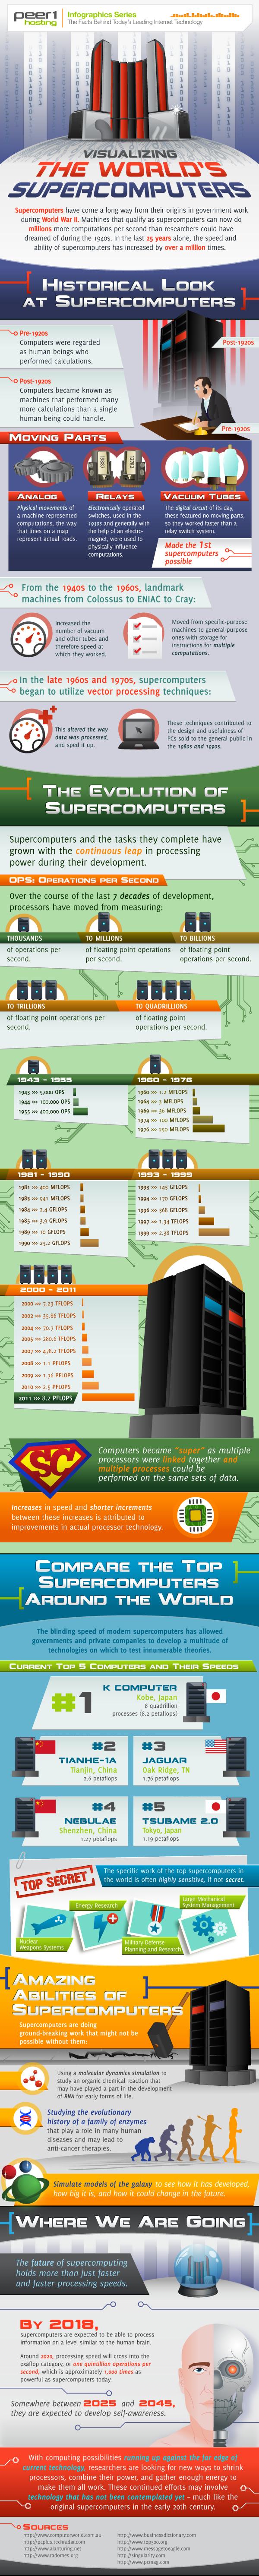 Actualidad Informática. Infografía superordenadores. Rafael Barzanallana